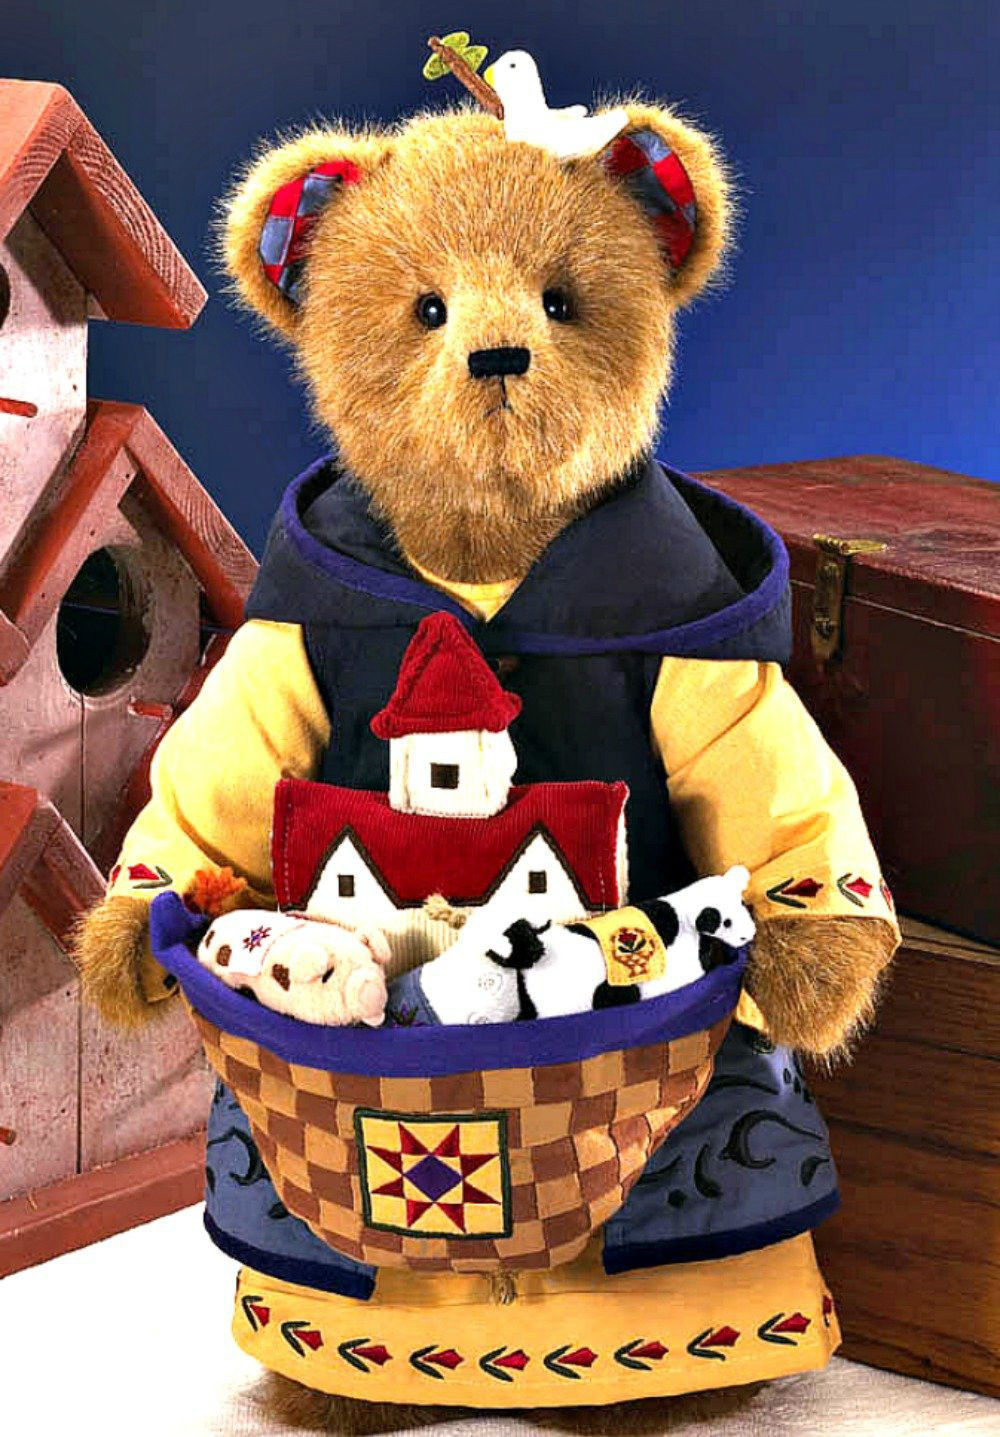 "Boyds Bears - Jim Shore ""All Aboard"" #92006-16 - 20"" Plush Bear-NWT-2008-Retired"